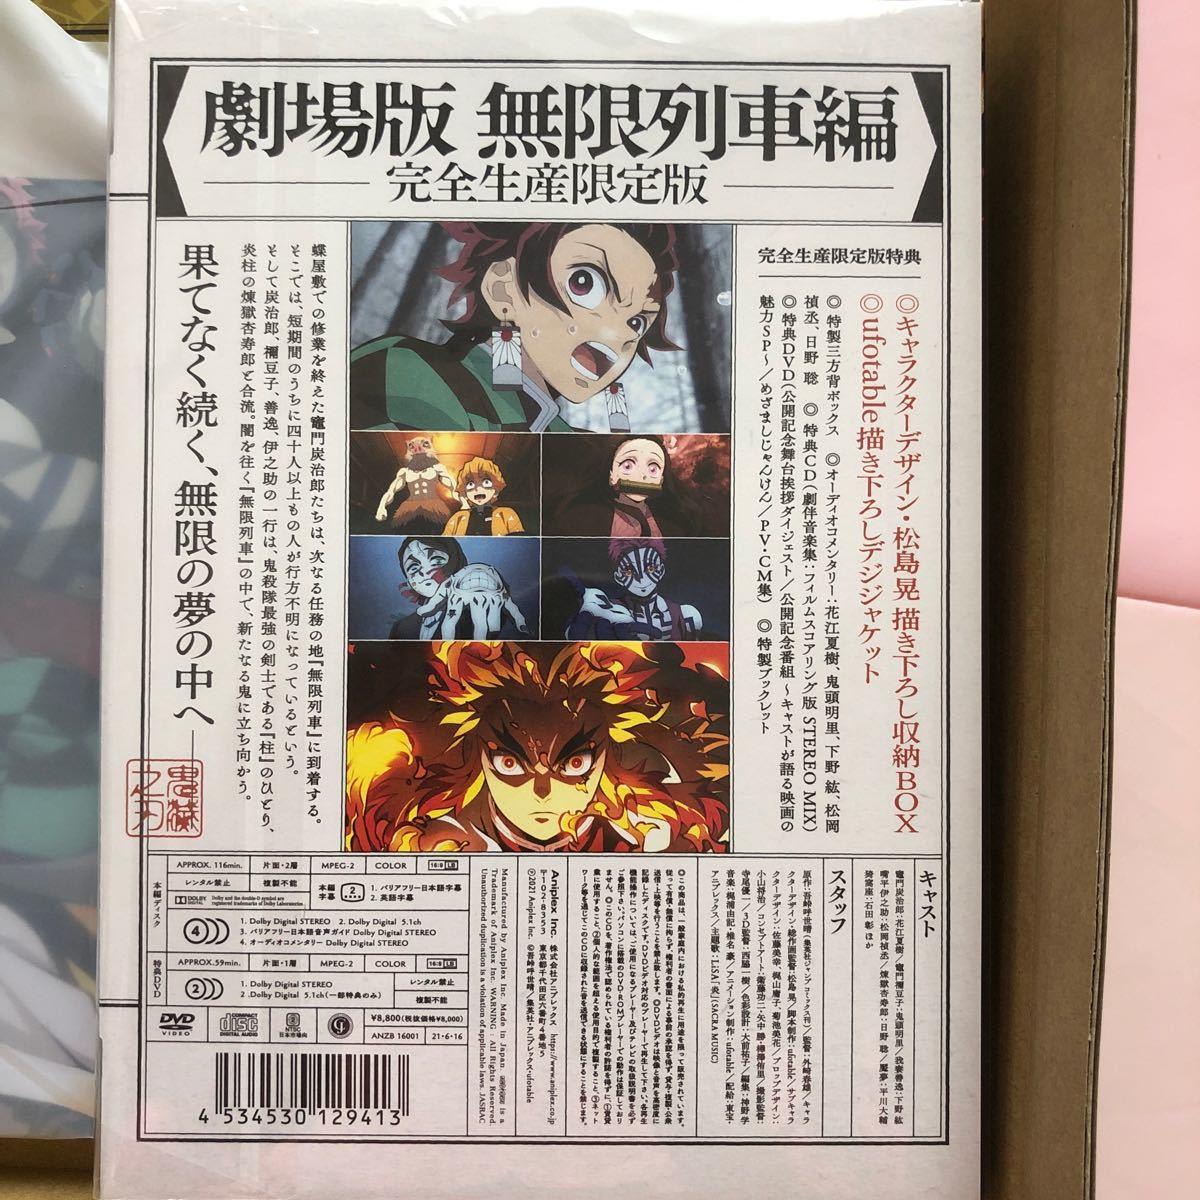 【特典付き】 劇場版 「鬼滅の刃」 無限列車編 完全生産限定版 DVD ゲオ限定